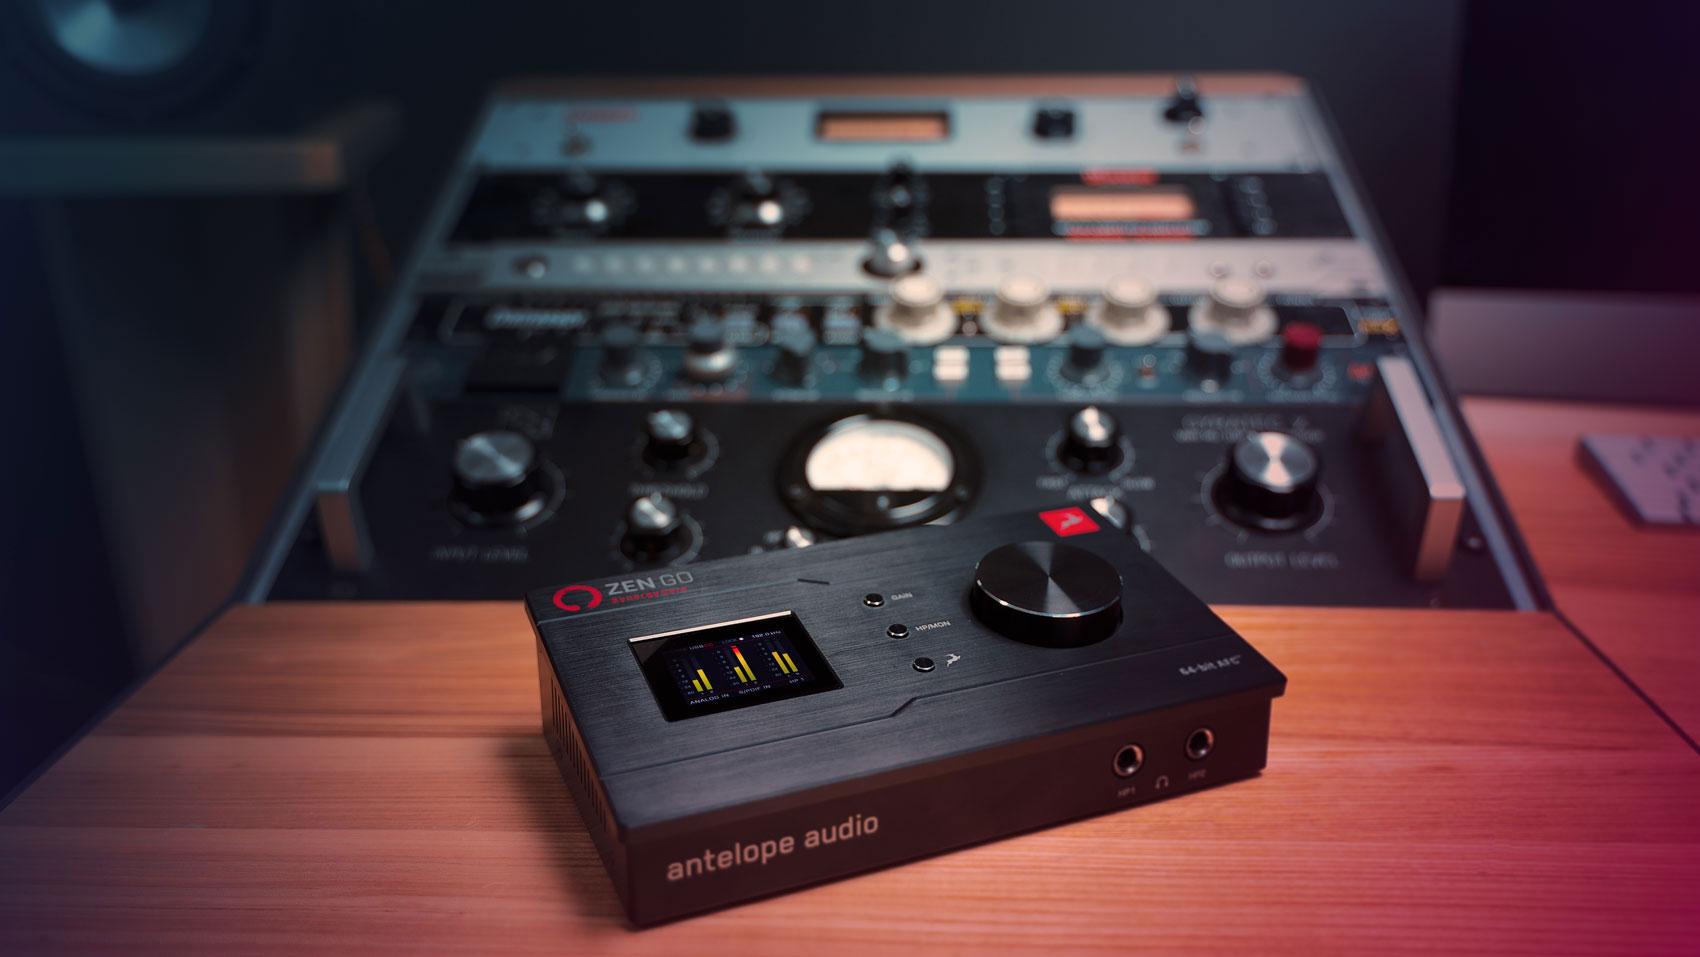 Antelope Zen Go Synergy Core Desktop 4x8 USB Type-C Audio Interface